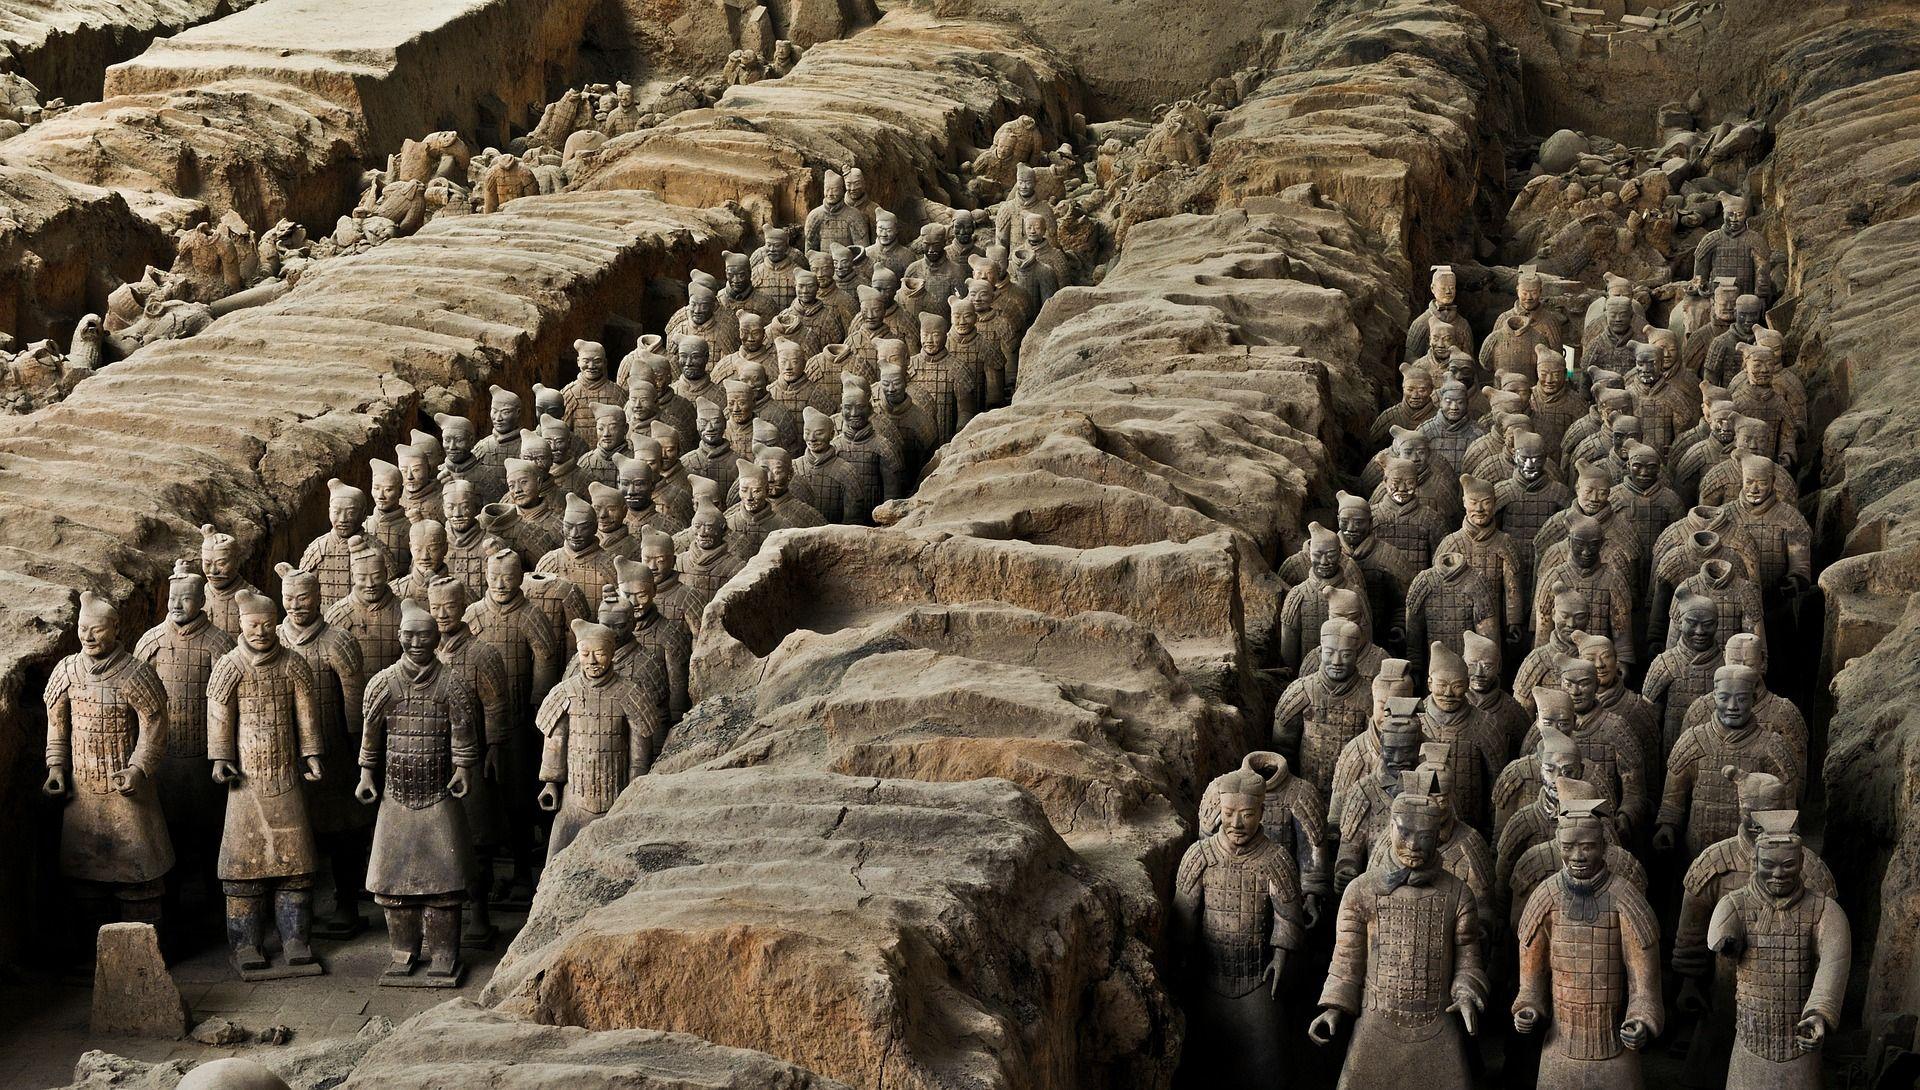 Kineski car naredio da mu pronađu eliksir besmrtnosti